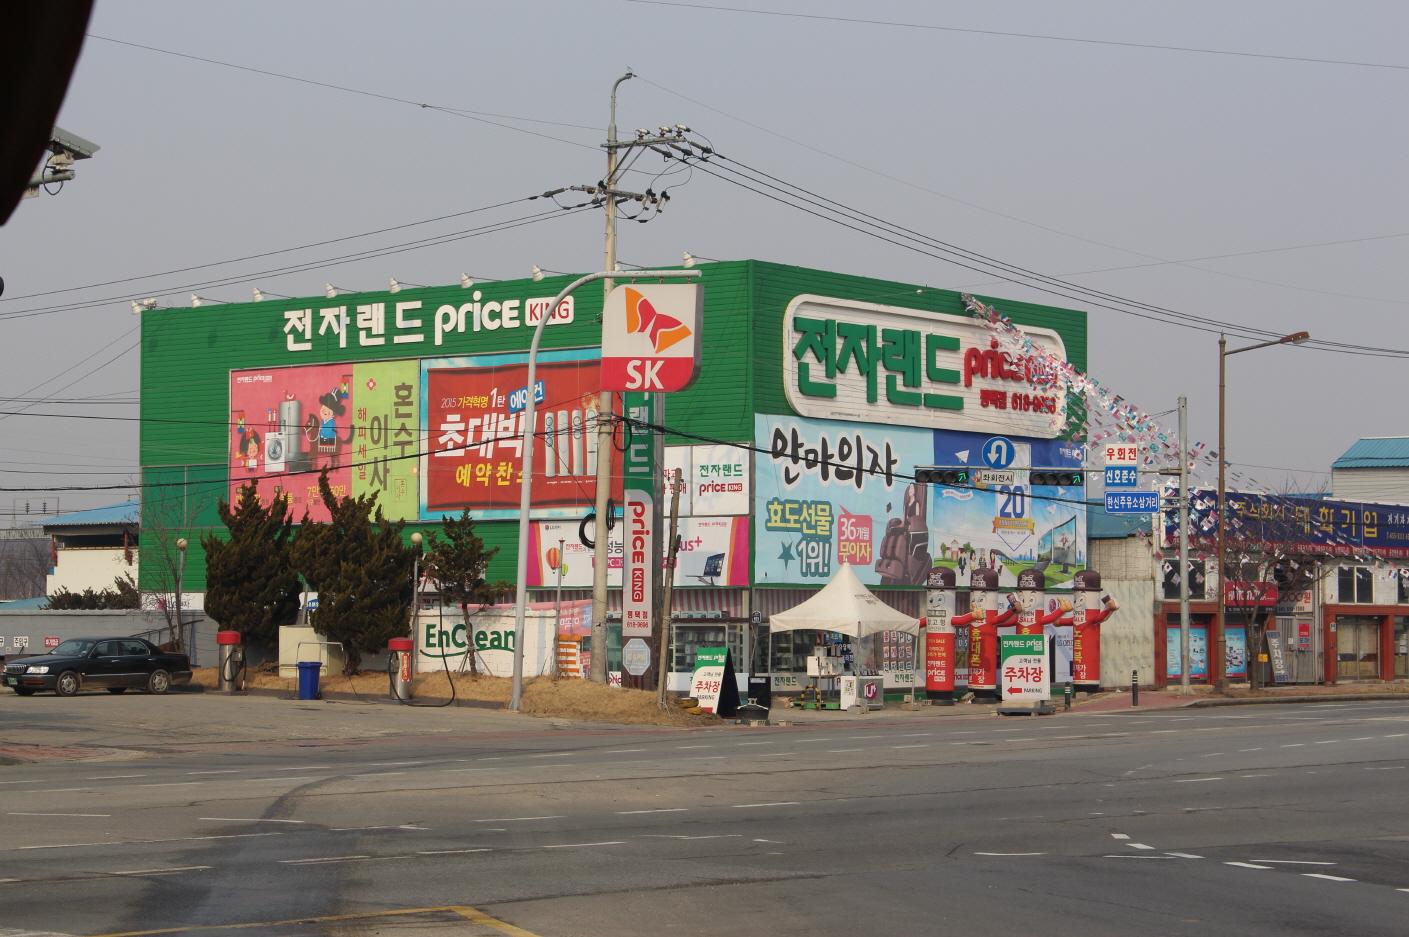 ET Land Price King – Pyeongtaek Branch (전자랜드 프라이스킹 (평택점))